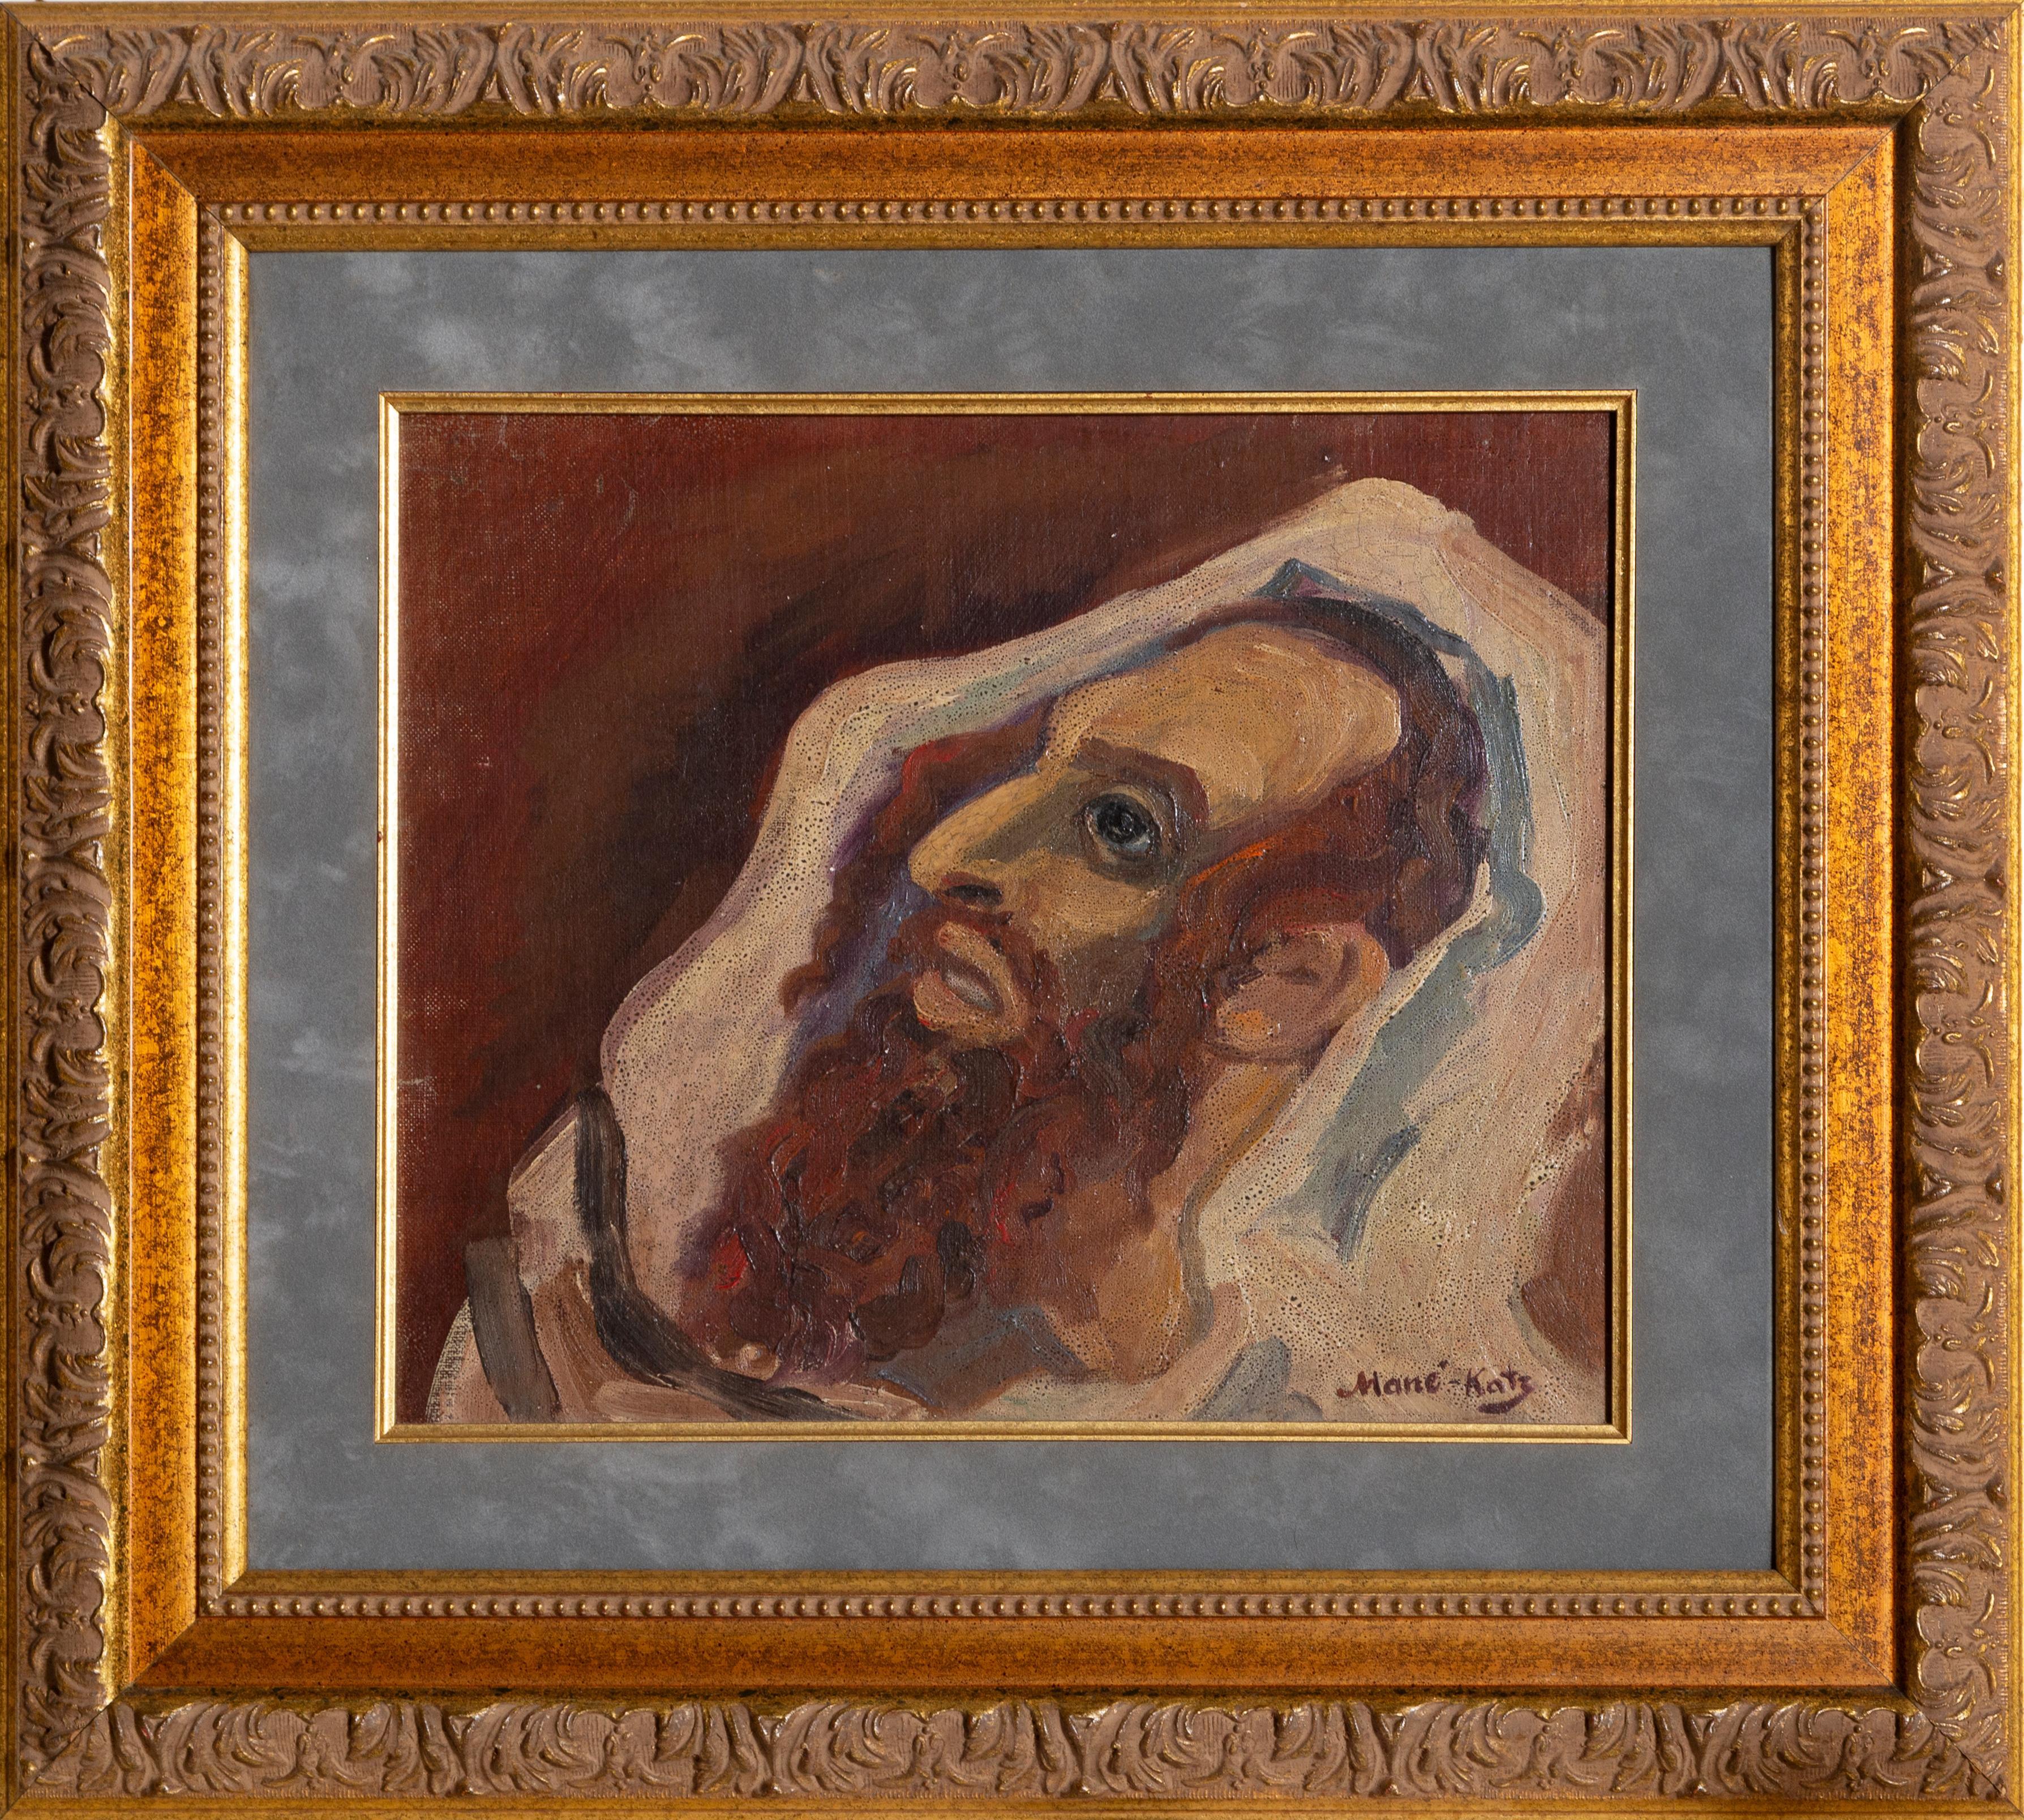 Rabbi, Oil Painting by Mane-Katz